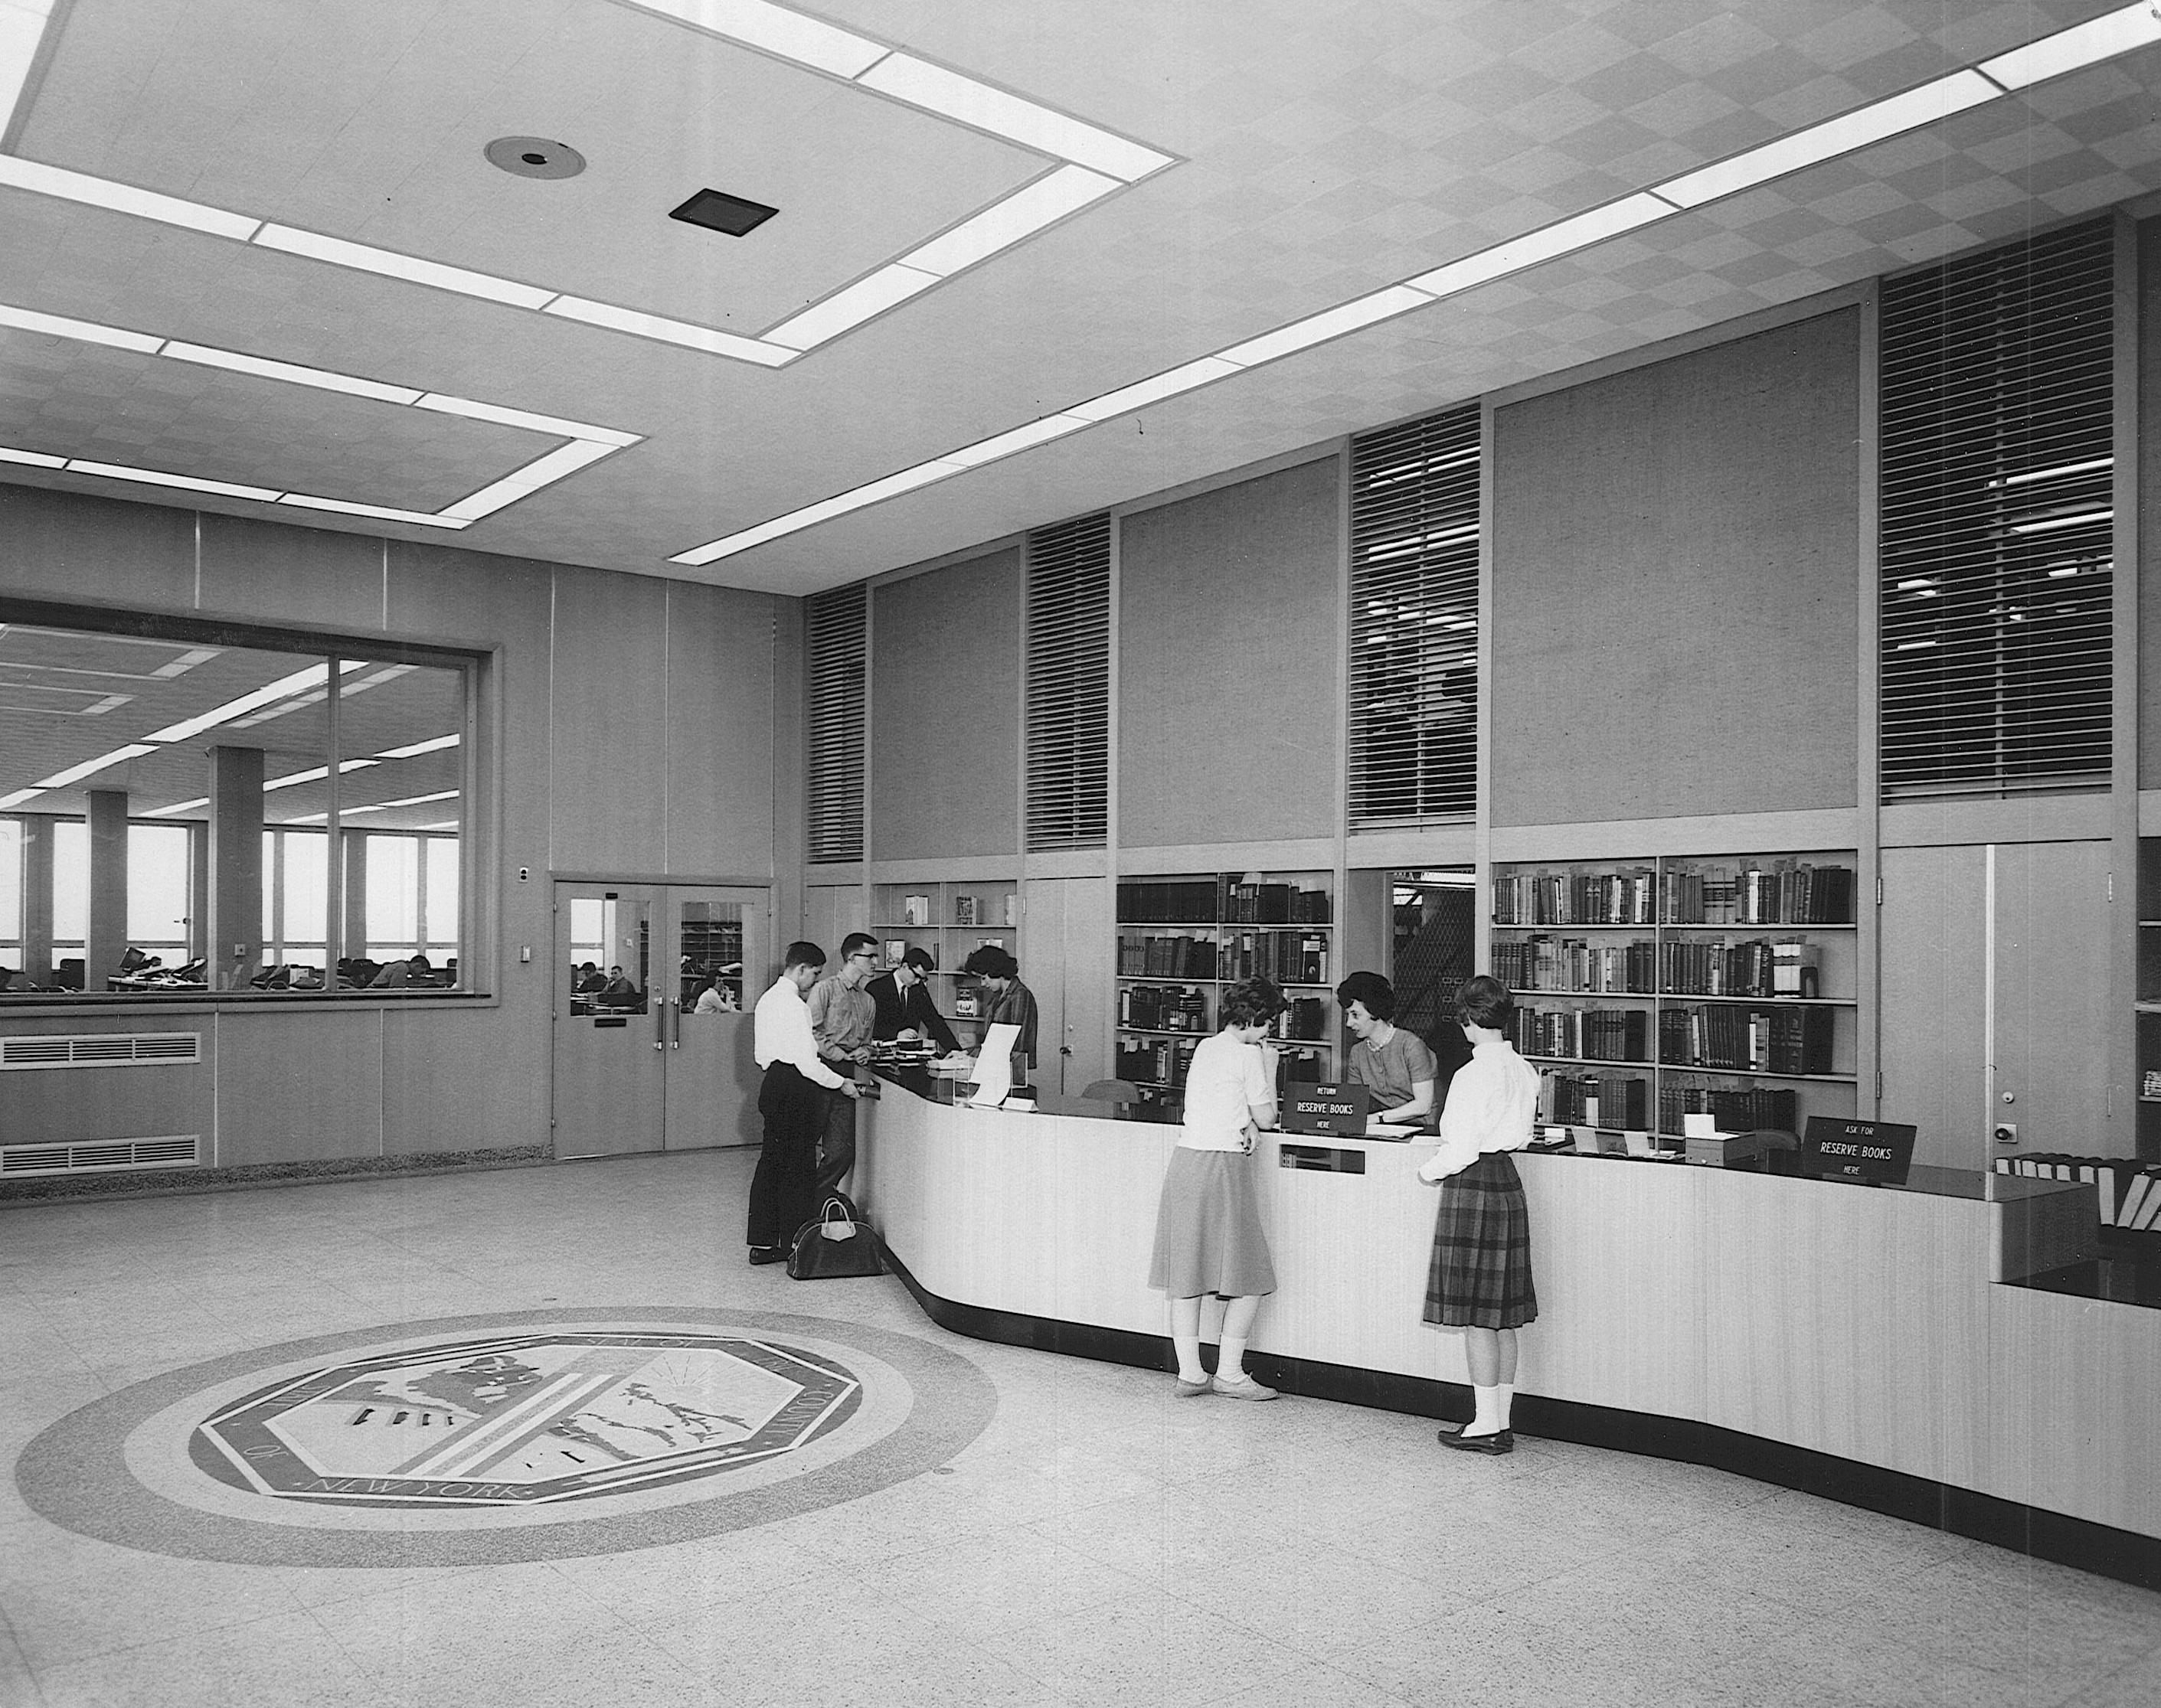 Library front desk, circa 1960s.